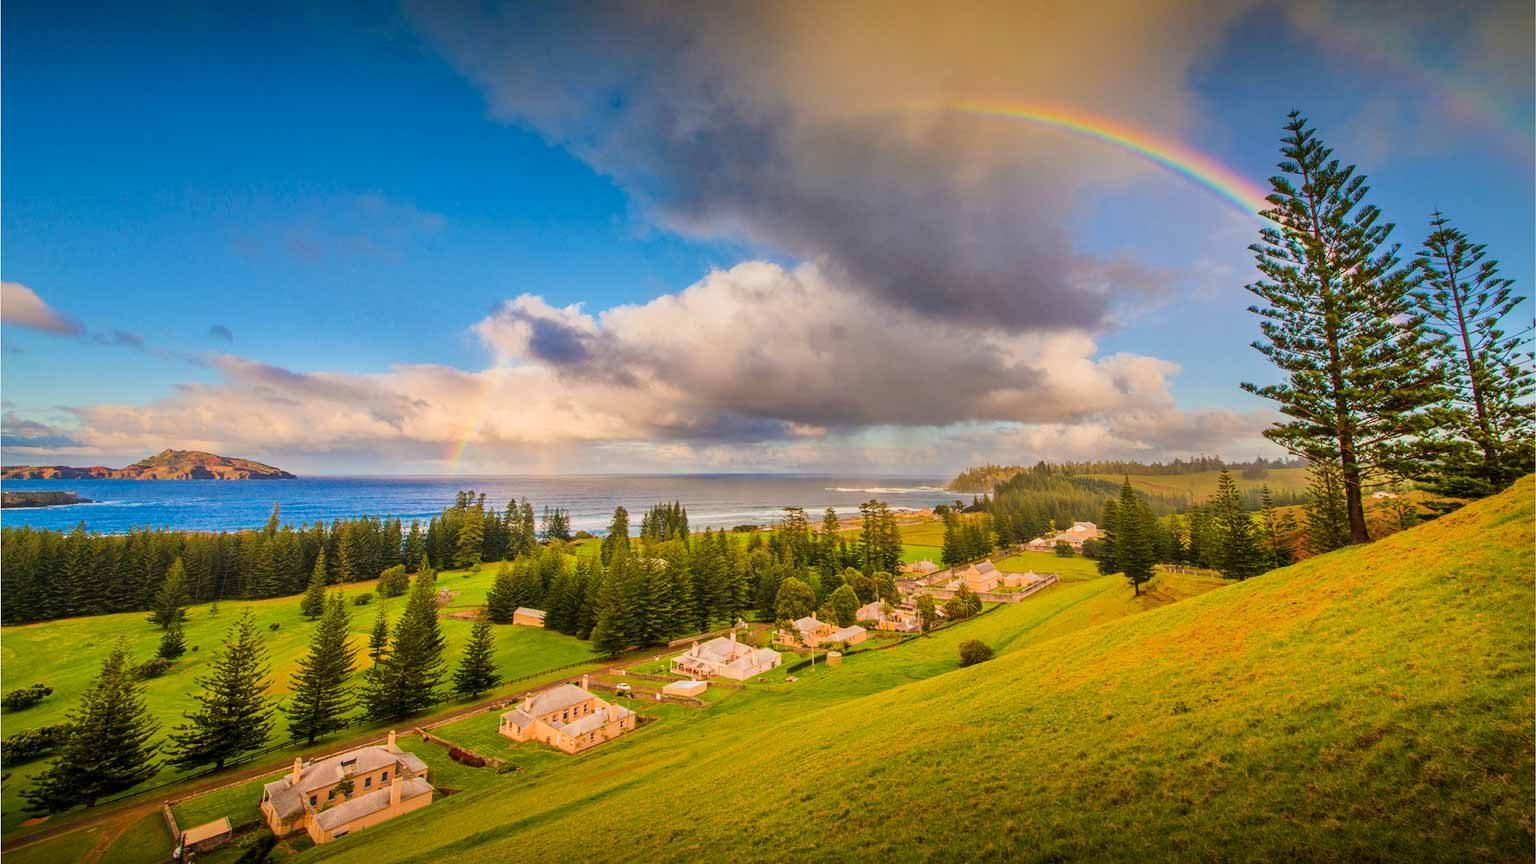 Cheap Norfolk Island flights to book in 2020